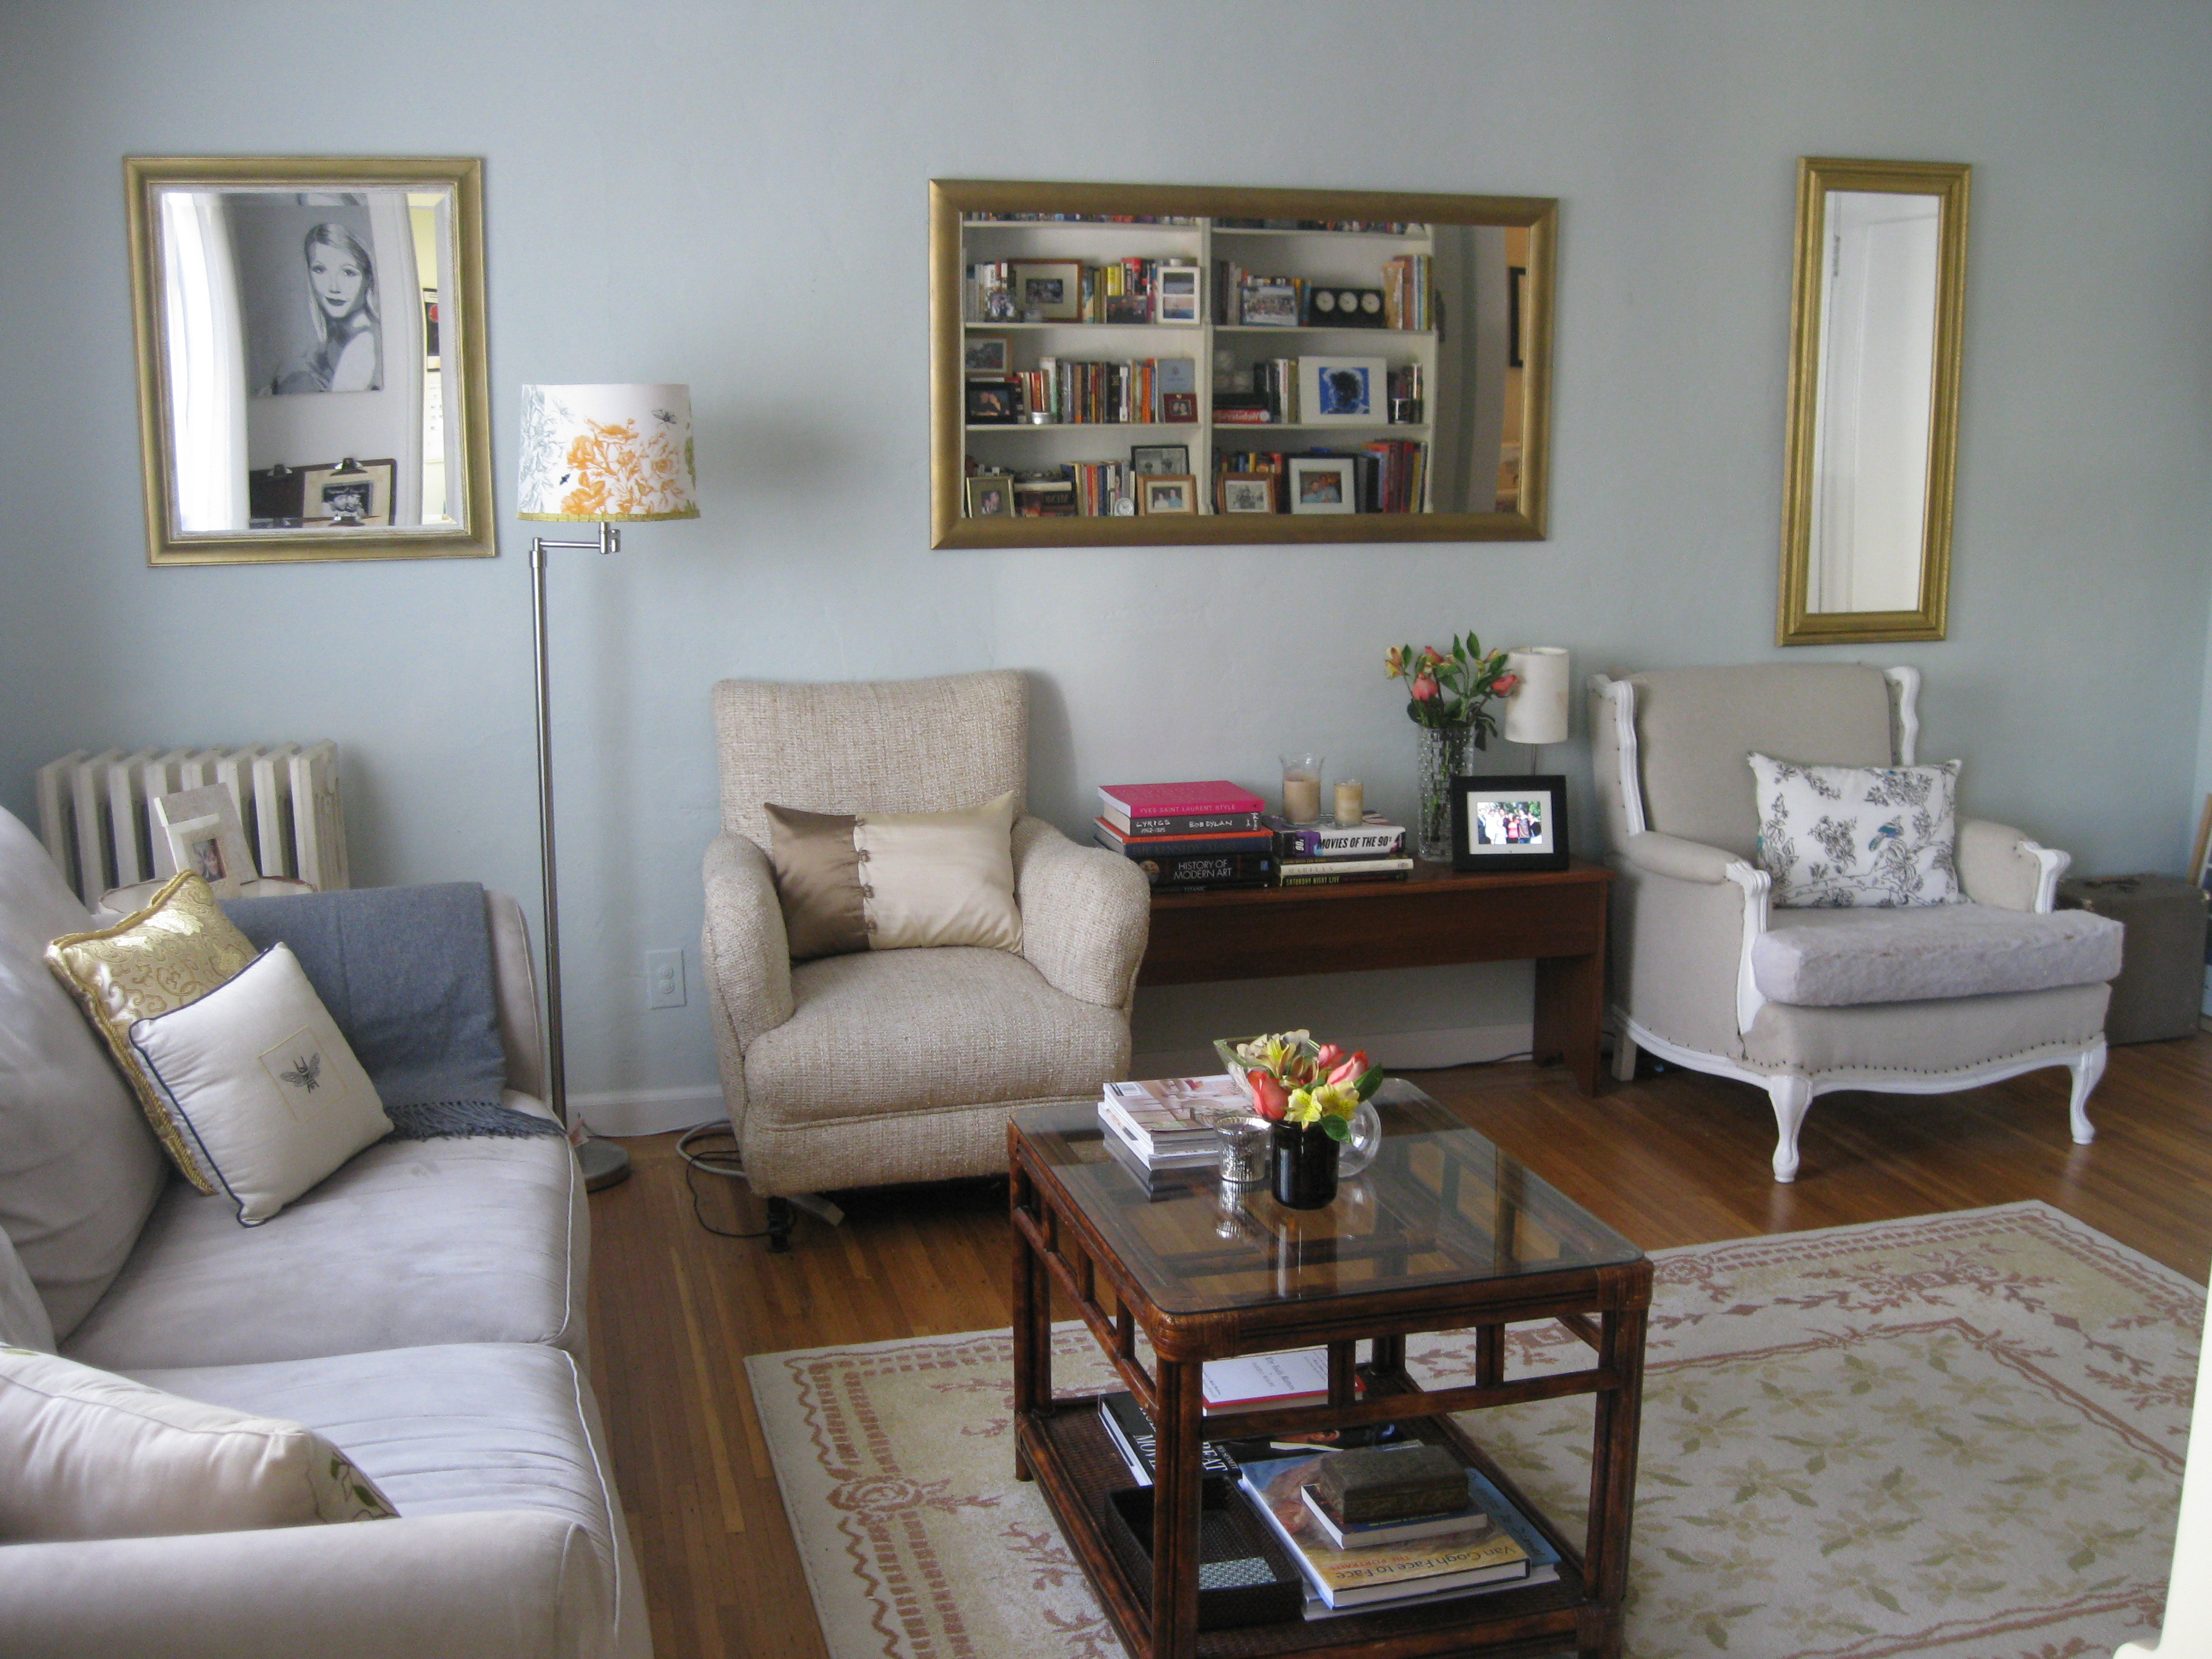 Kylee's living room